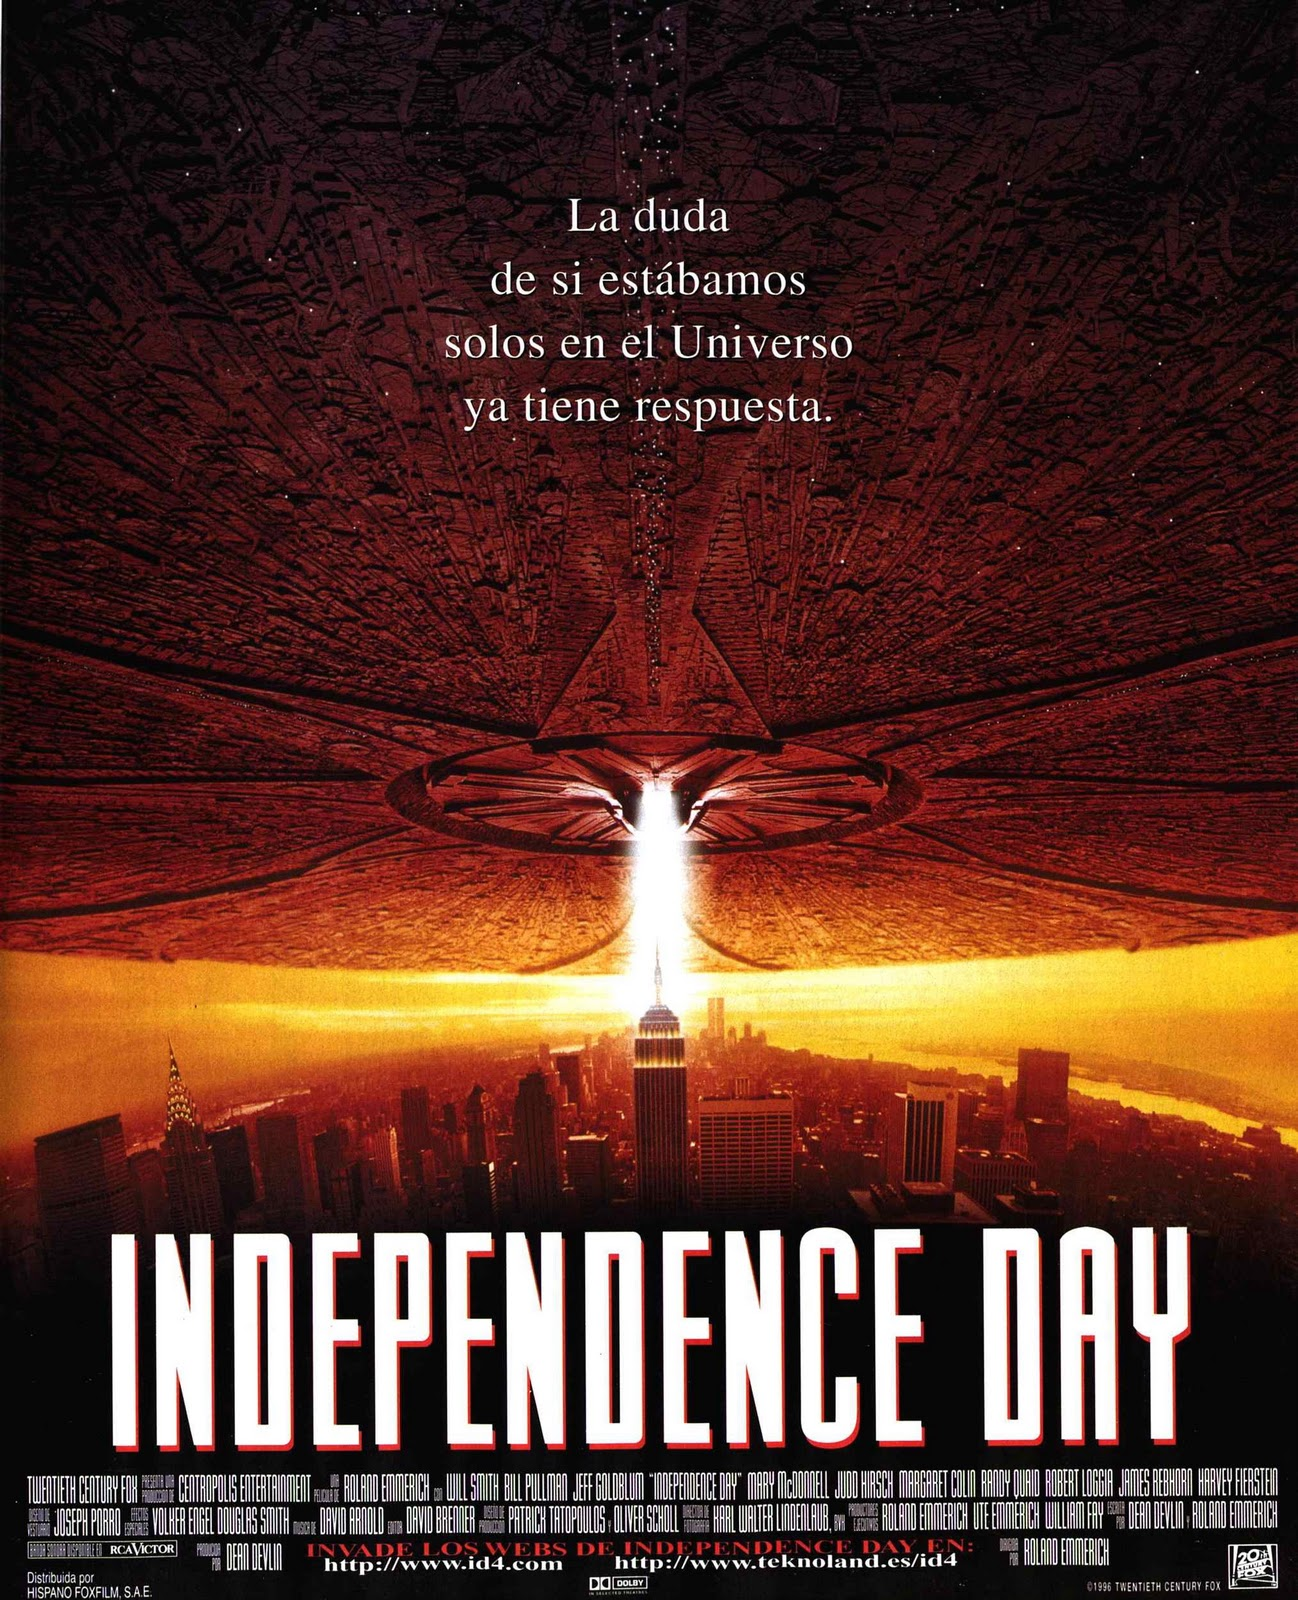 http://3.bp.blogspot.com/-GVVP-eI9Ro8/T8kRlijhjkI/AAAAAAAAY38/E9pRRqX1NL4/s1600/Independence%2BDay.jpg